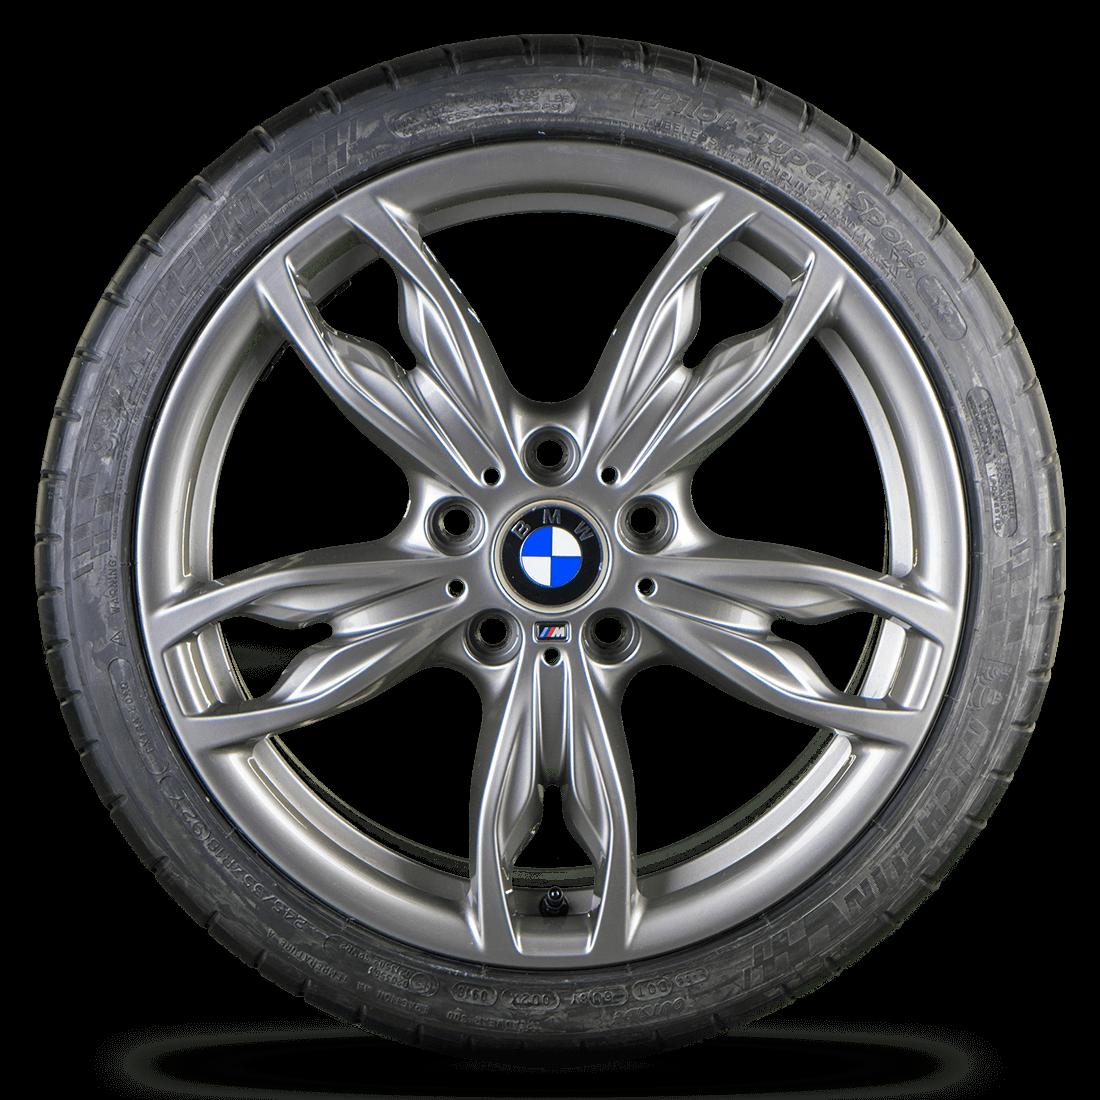 BMW 1er F20 F21 2er F22 F23 18 Zoll Sommerreifen Styling M436 M 436 Alufelgen